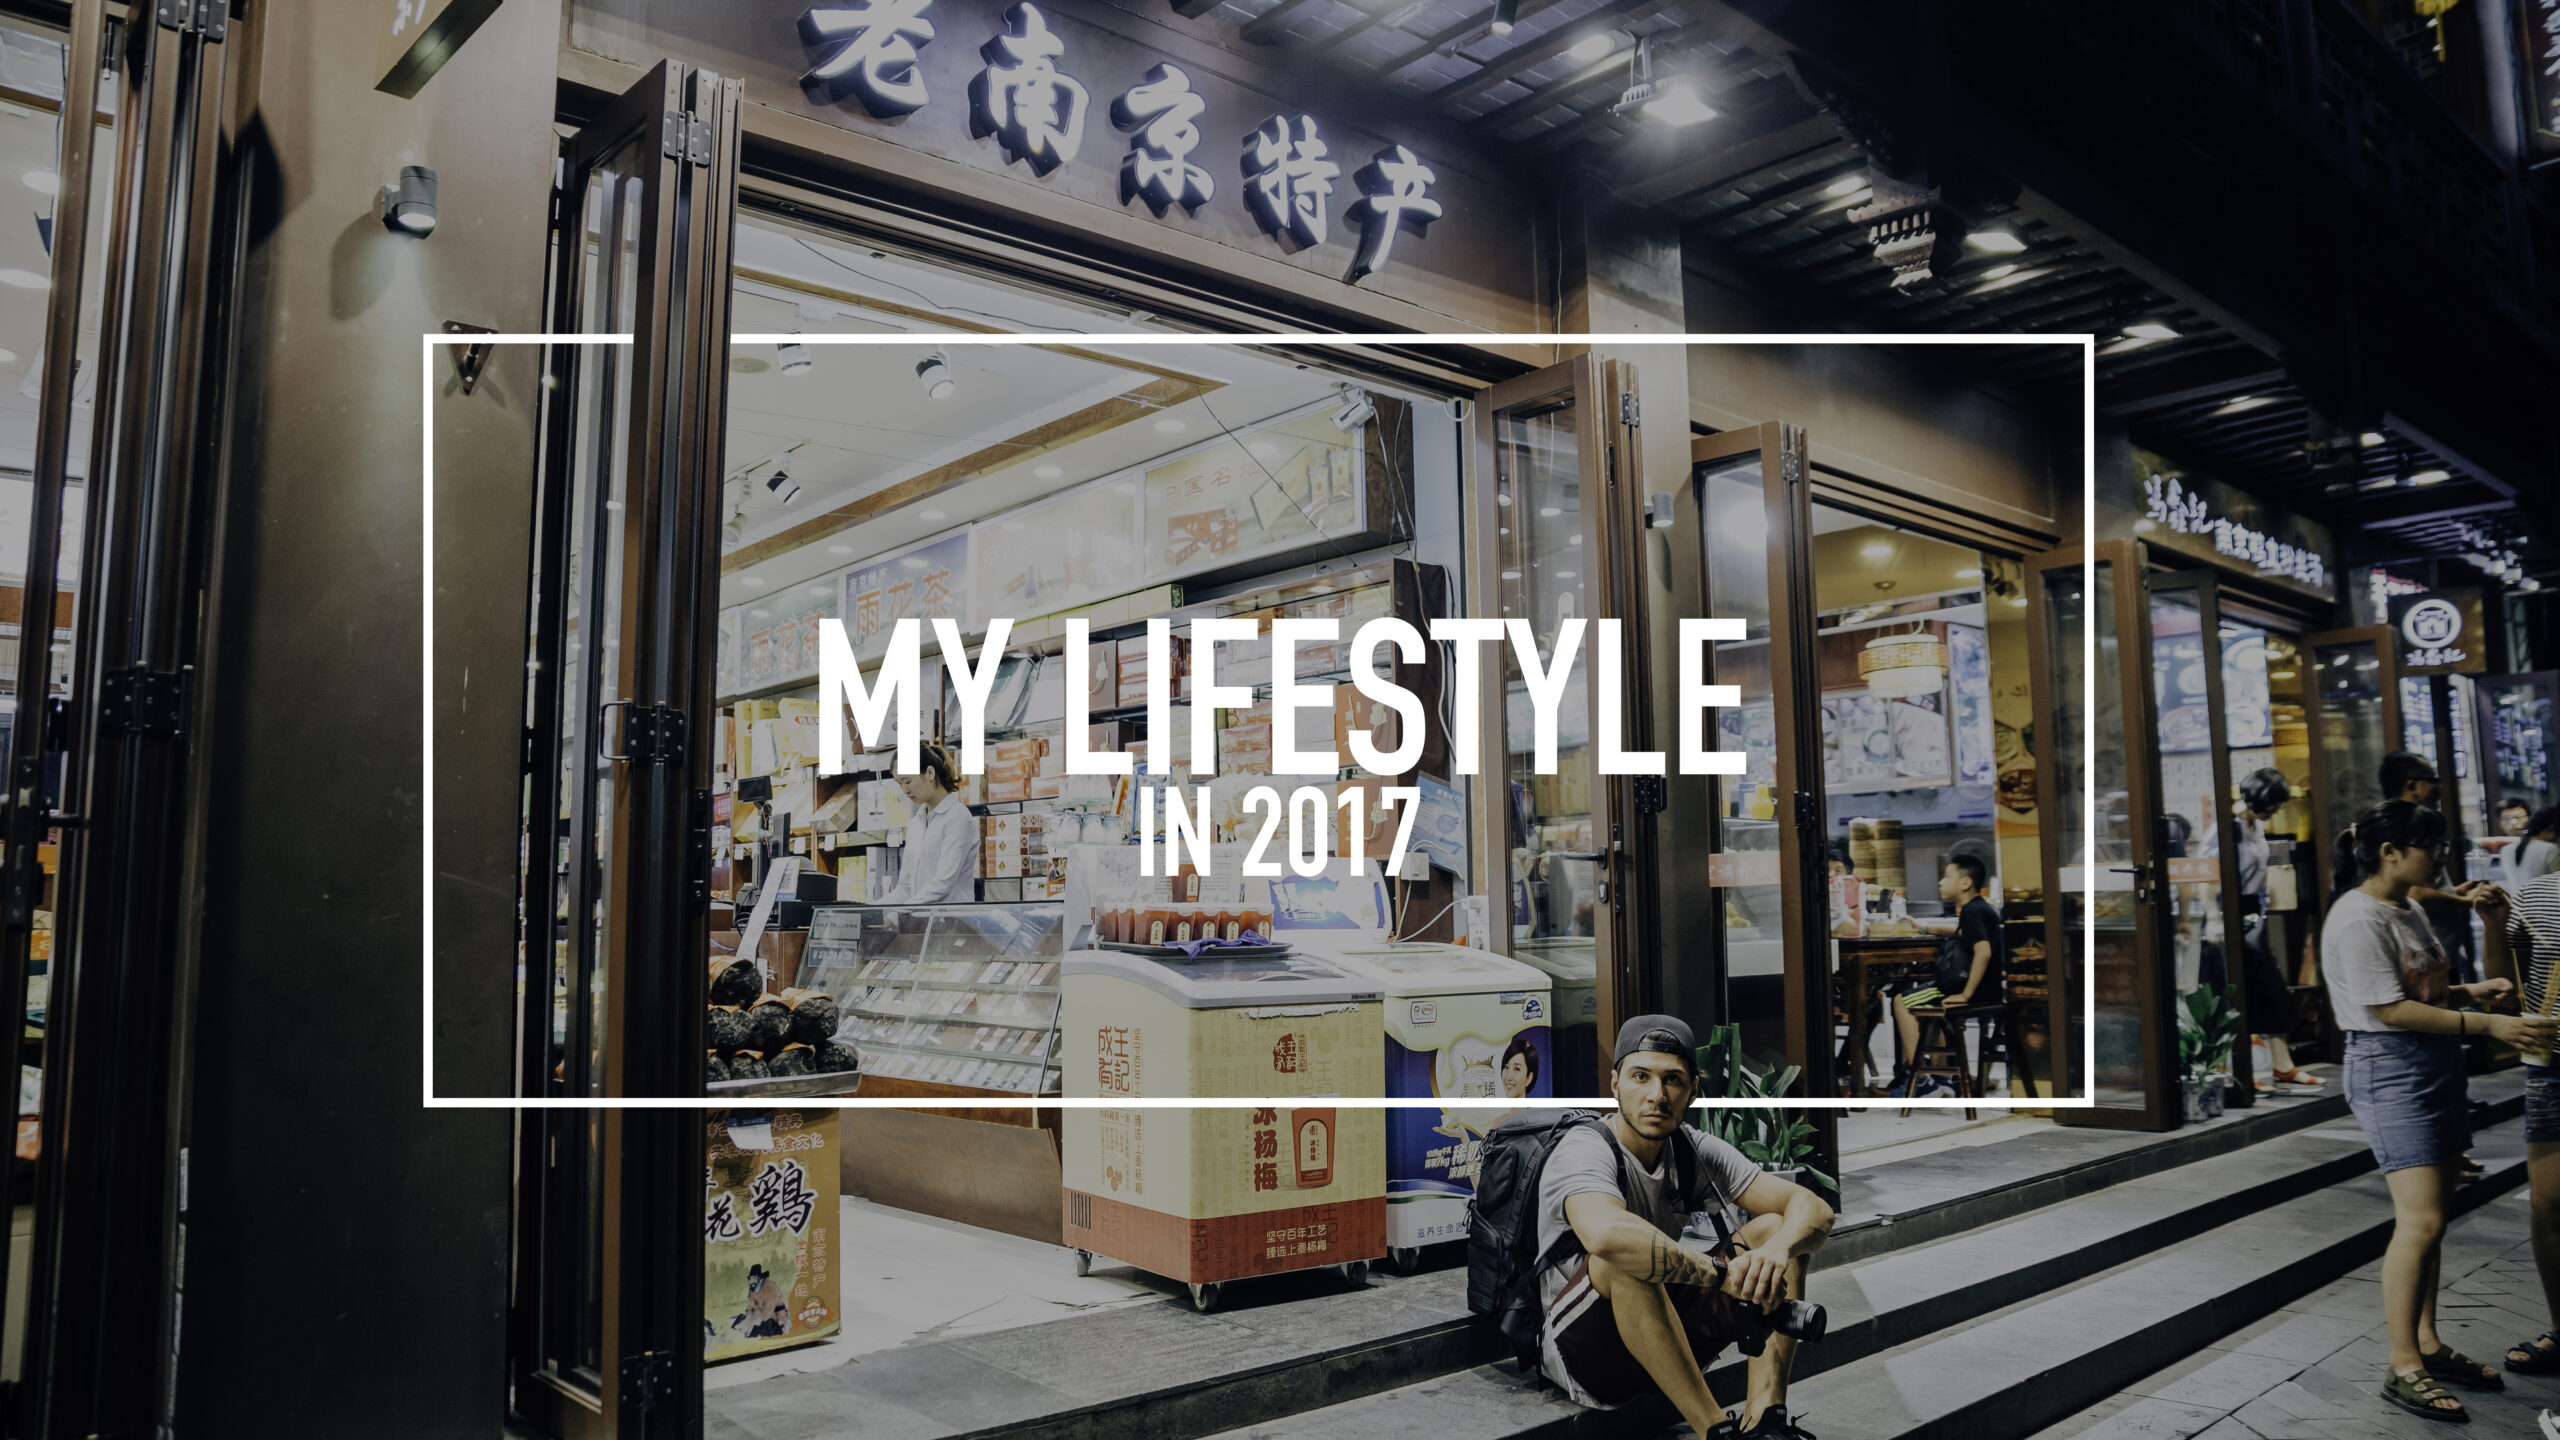 My Lifestyle 2017